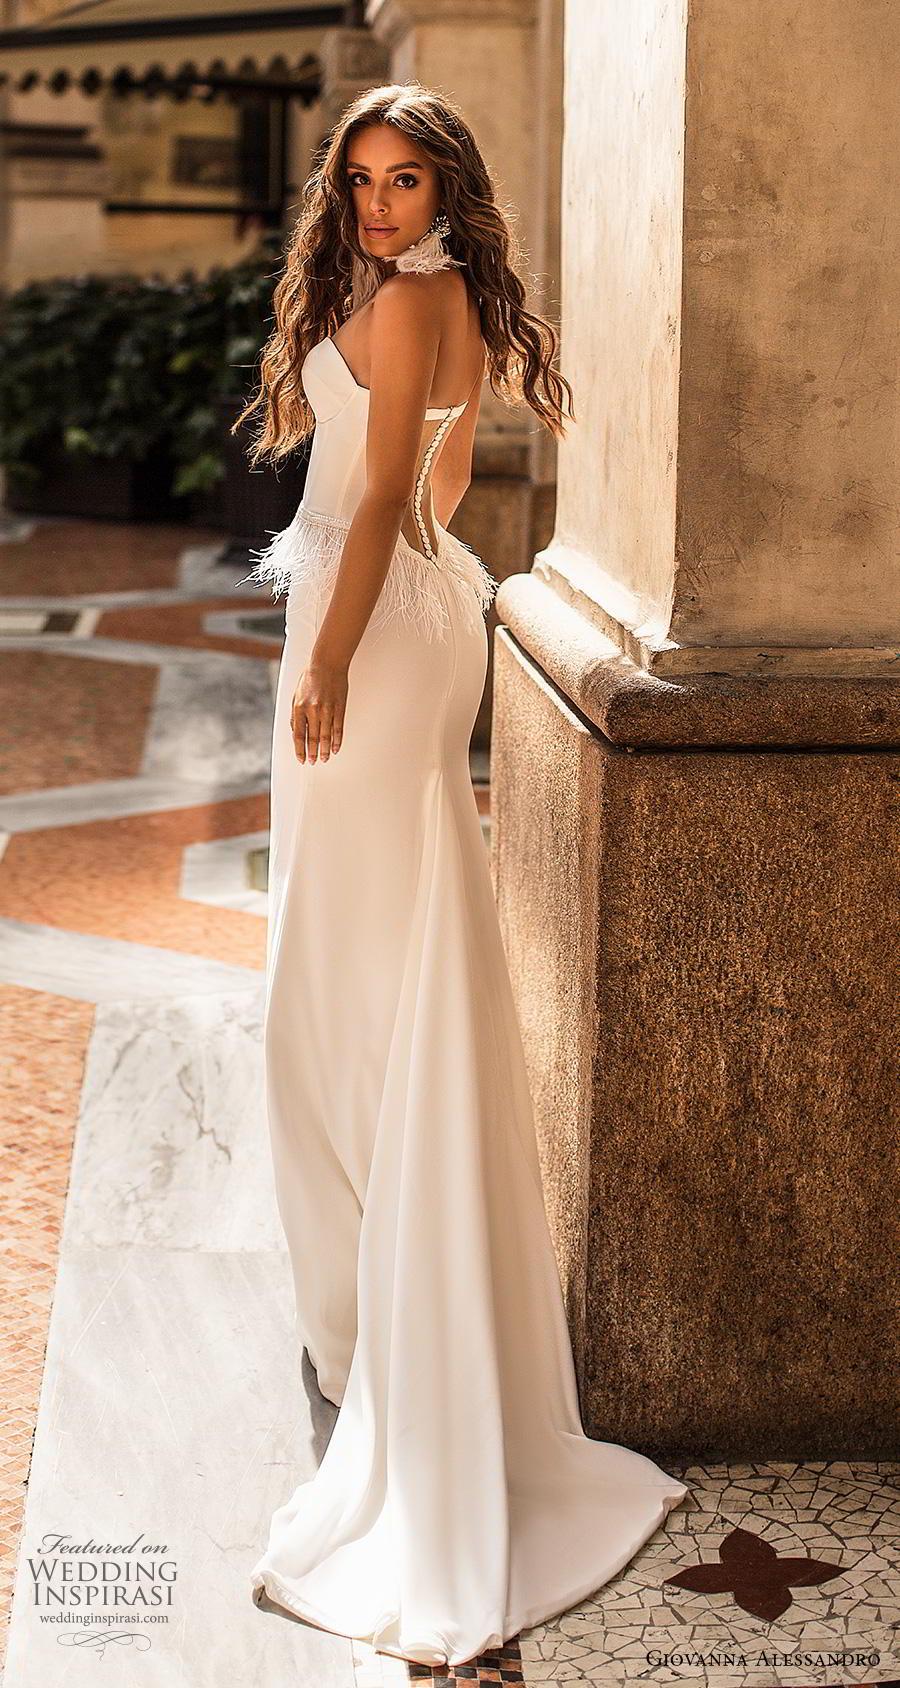 giovanna alessandro 2019 bridal strapless sweetheart neckline bustier bodice simple minimalist fringe waist elegant sheath wedding dress short train (12) bv